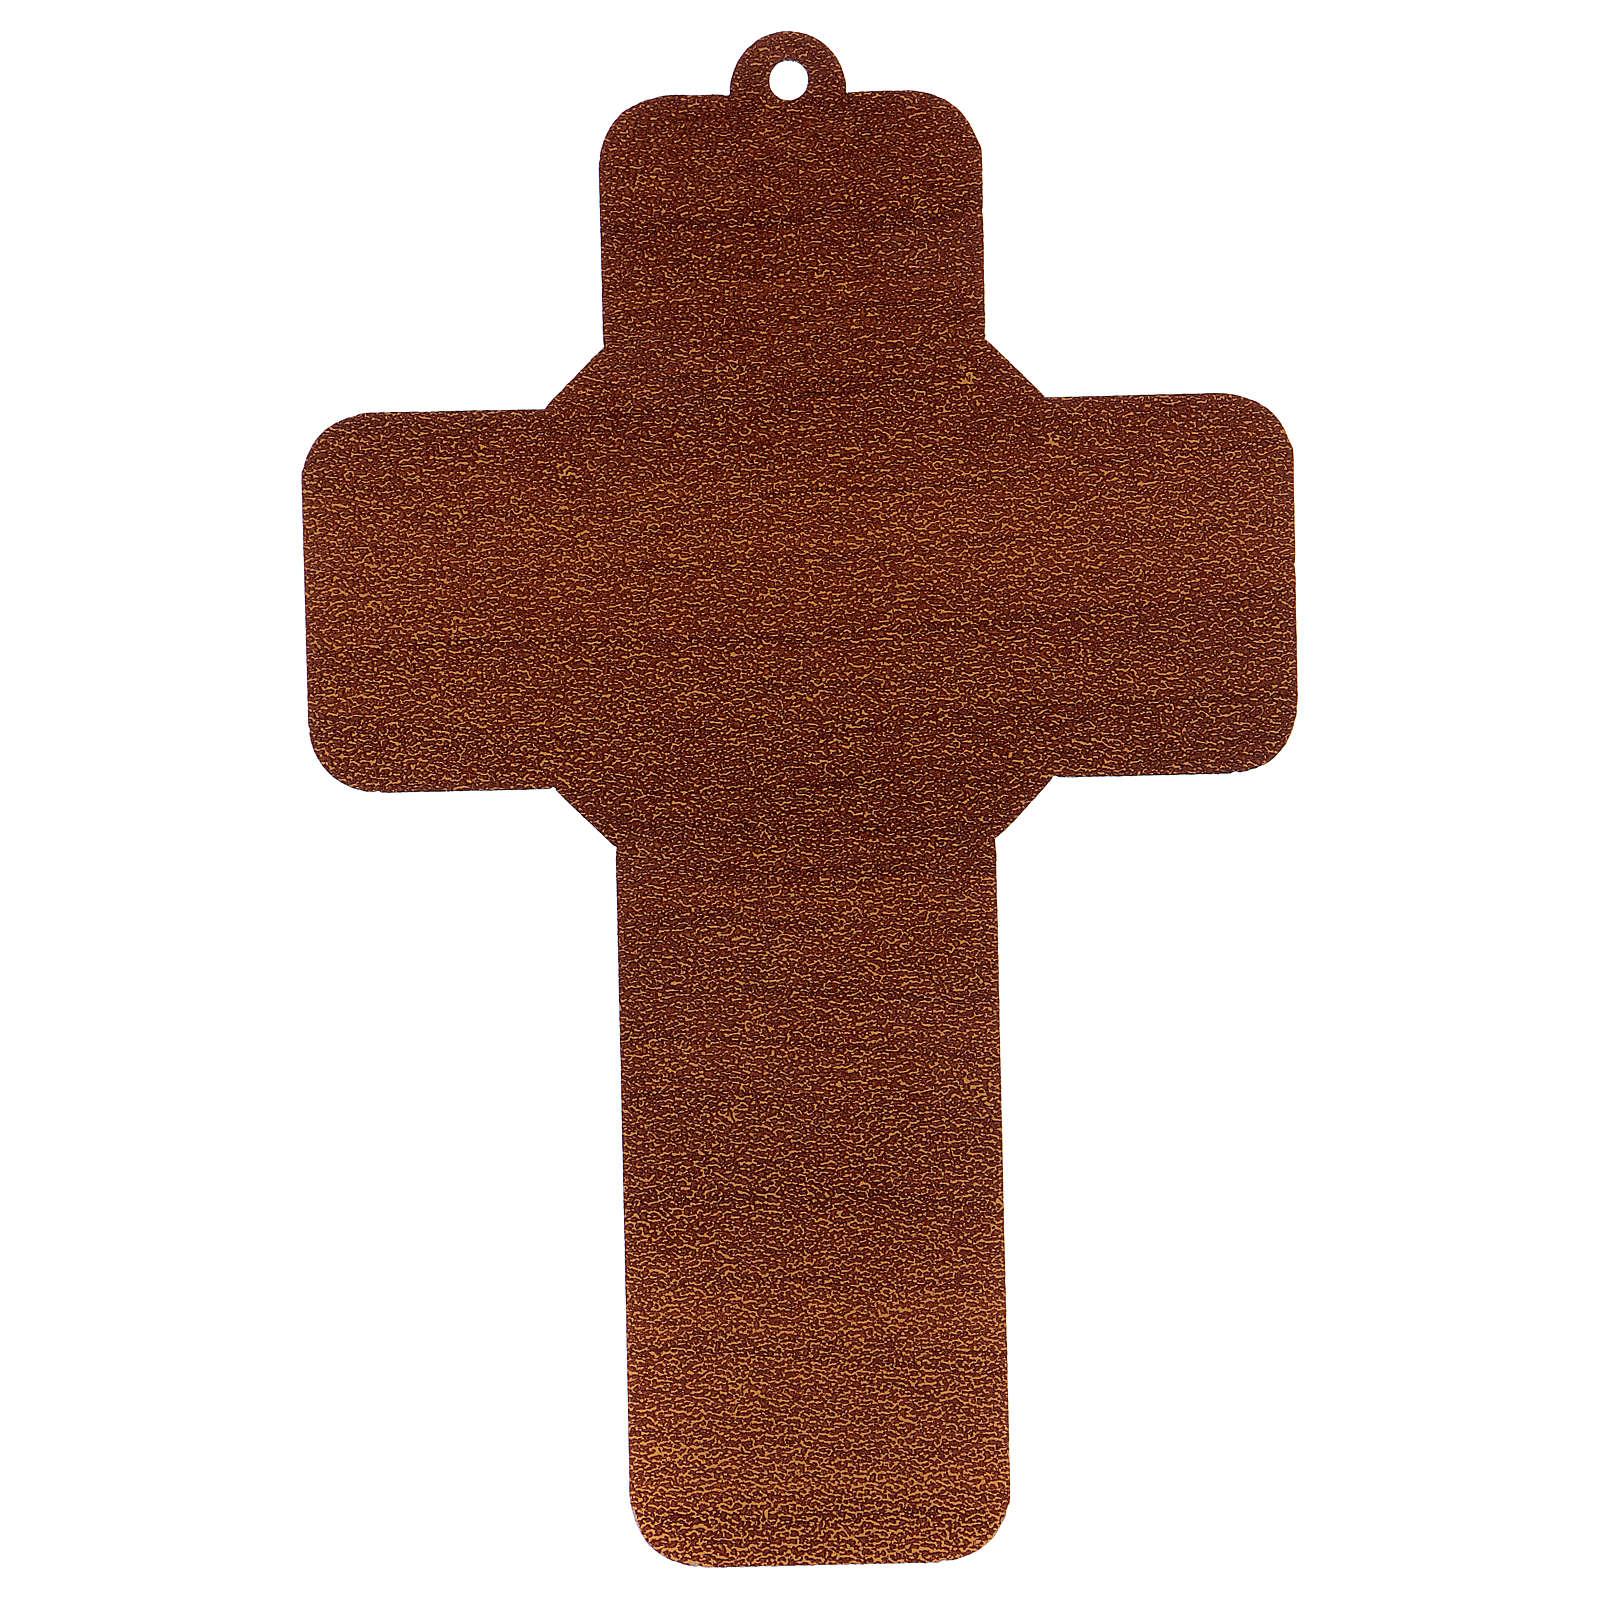 Croix pvc baptême 13x8,5 cm 3